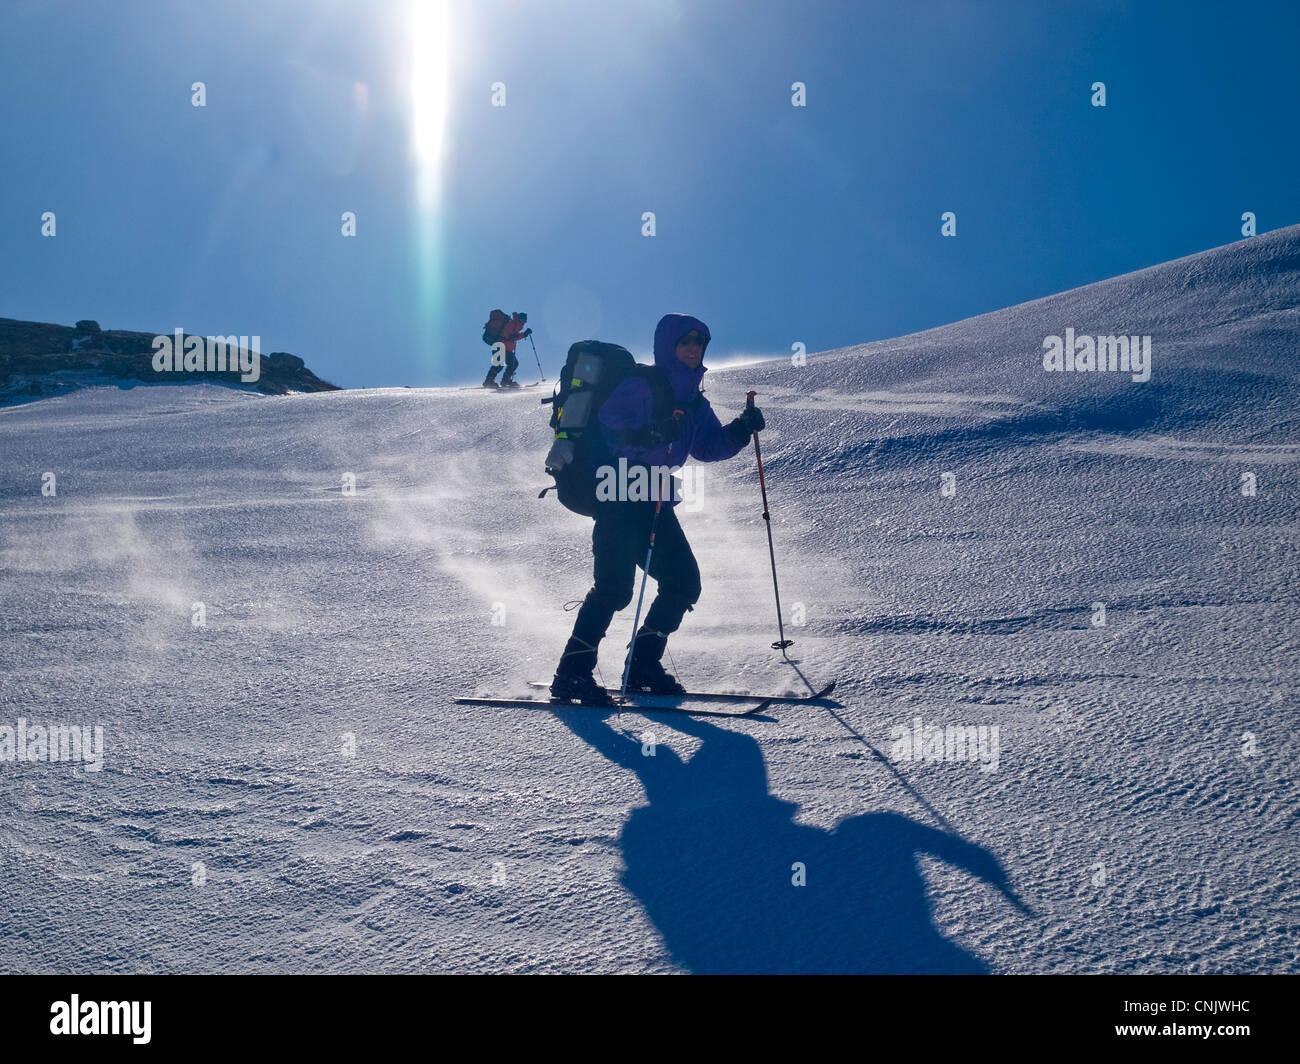 skitouring in the Hardanger region of Norway - Stock Image